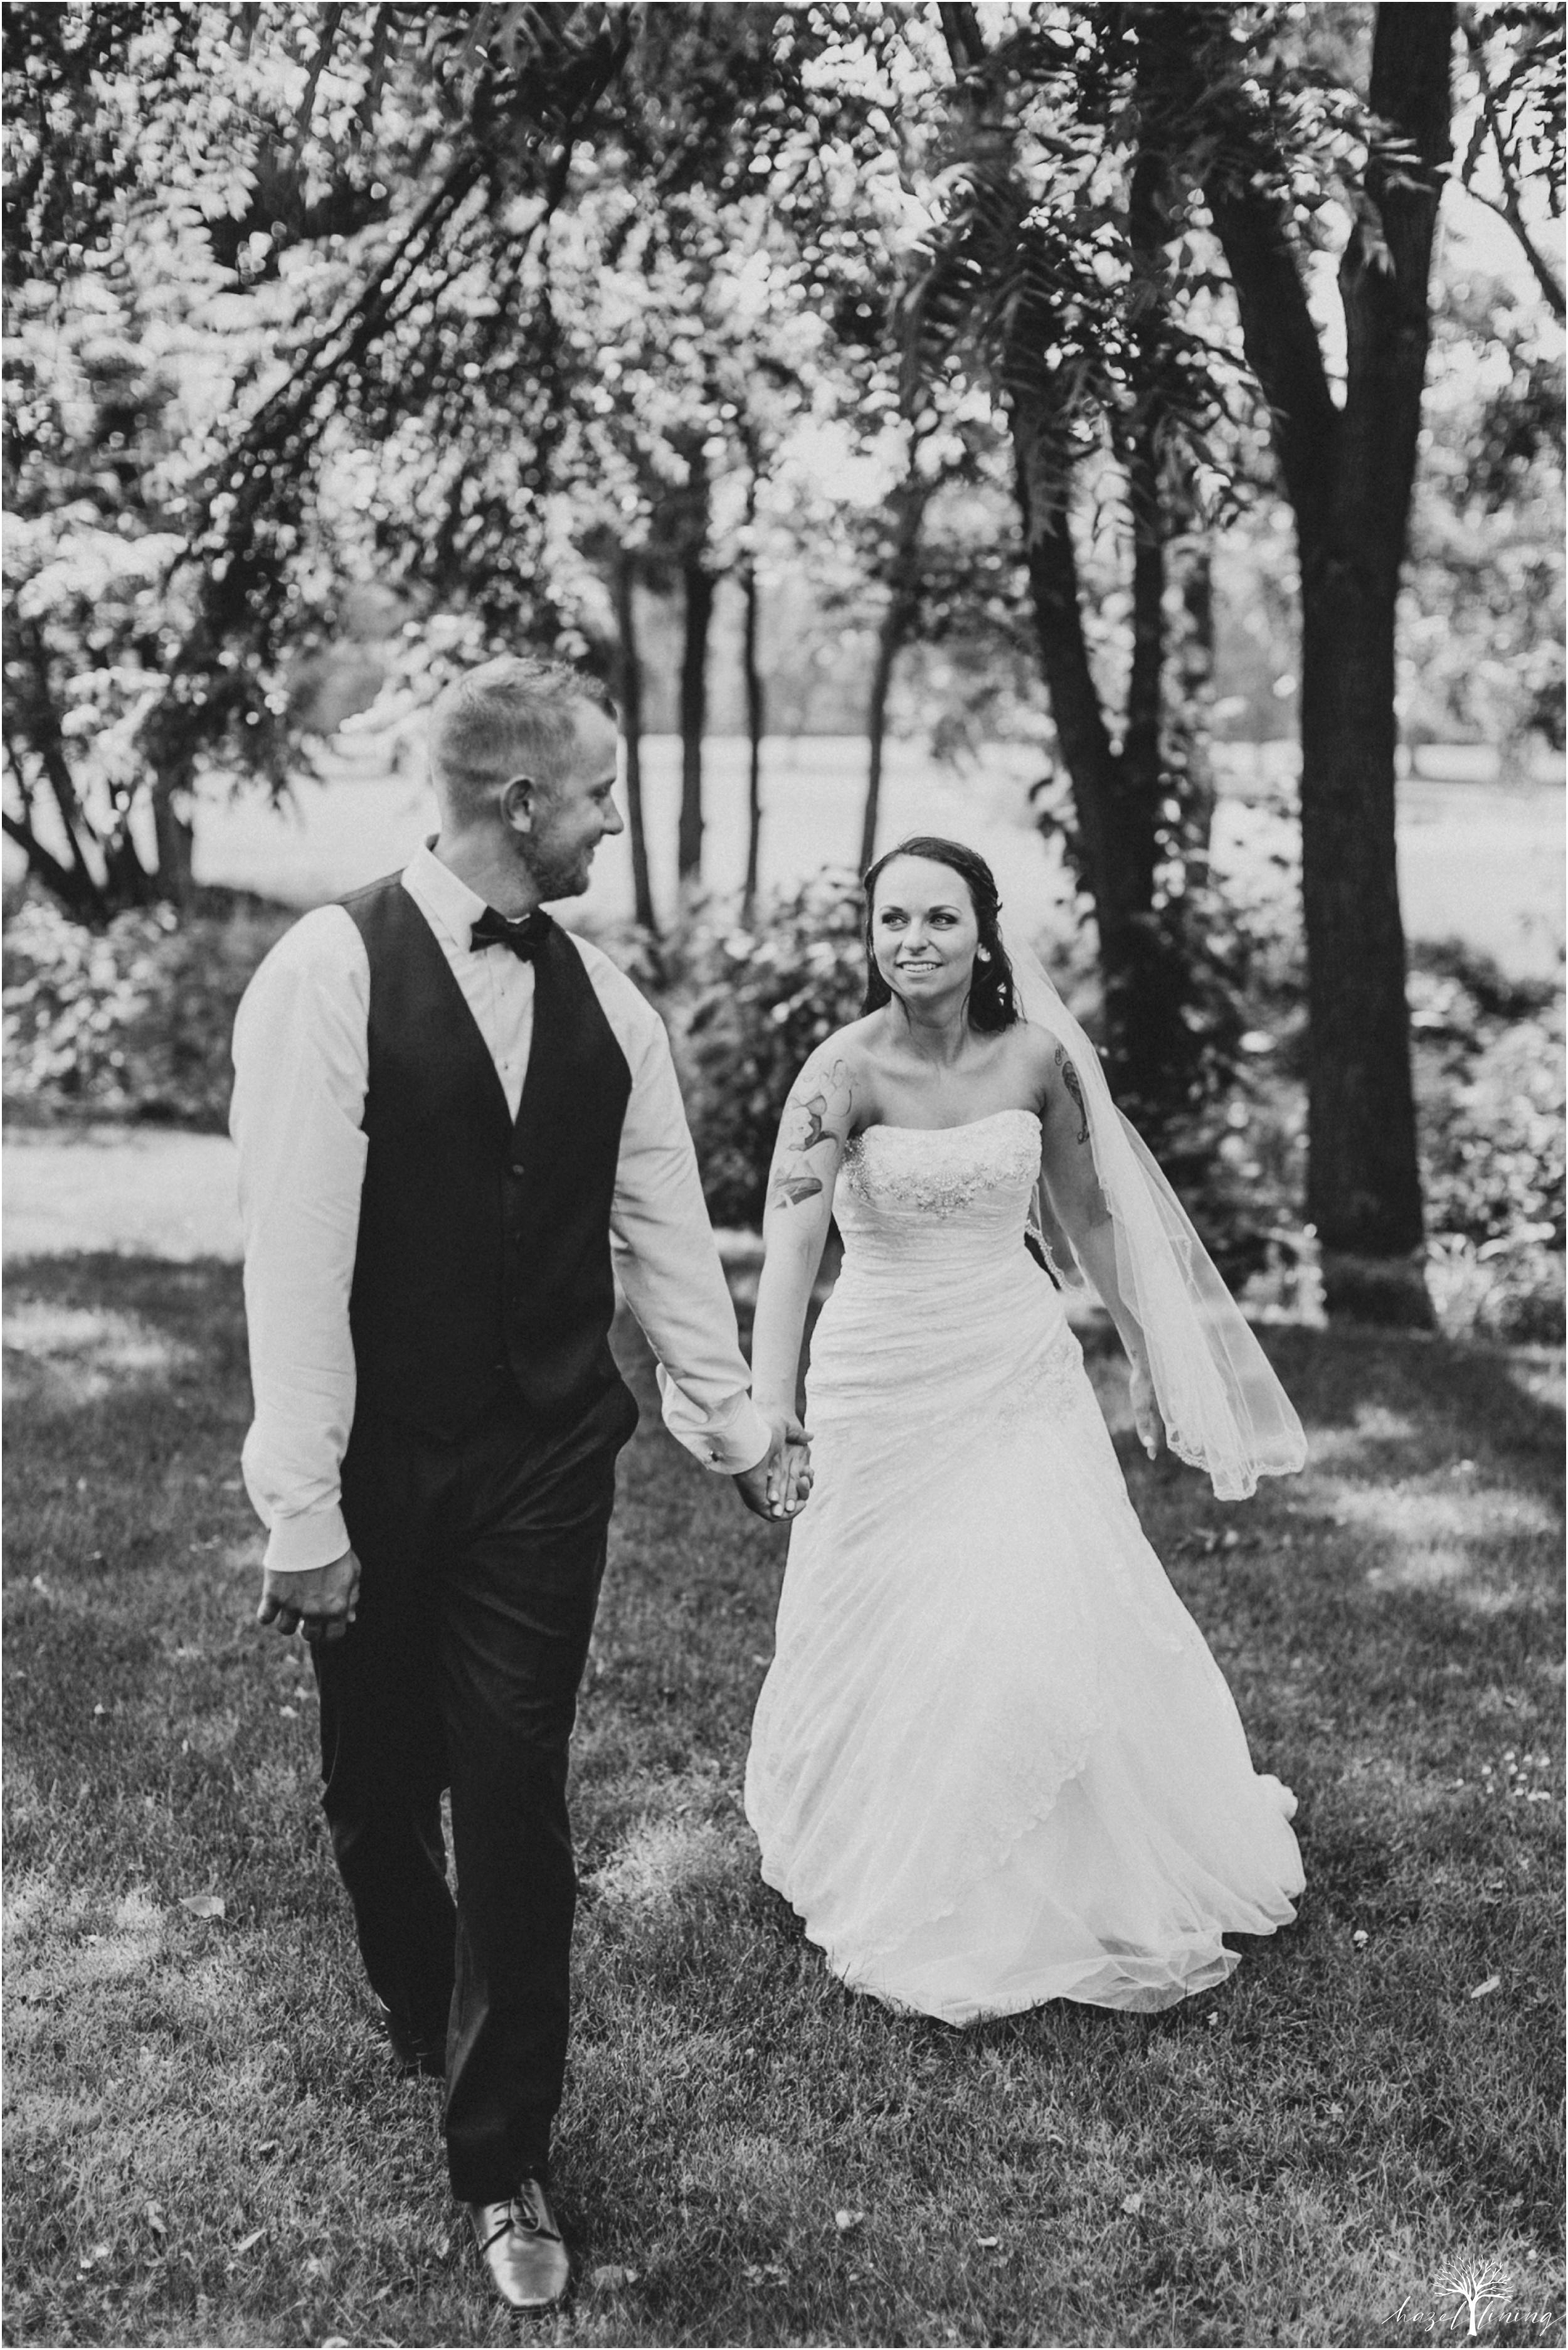 alyssa-james-stiteler-wedding-loft-and-sweet-water-cc-pennsburg-pennsylvania-hazel-lining-travel-wedding-elopement-photography_0089.jpg